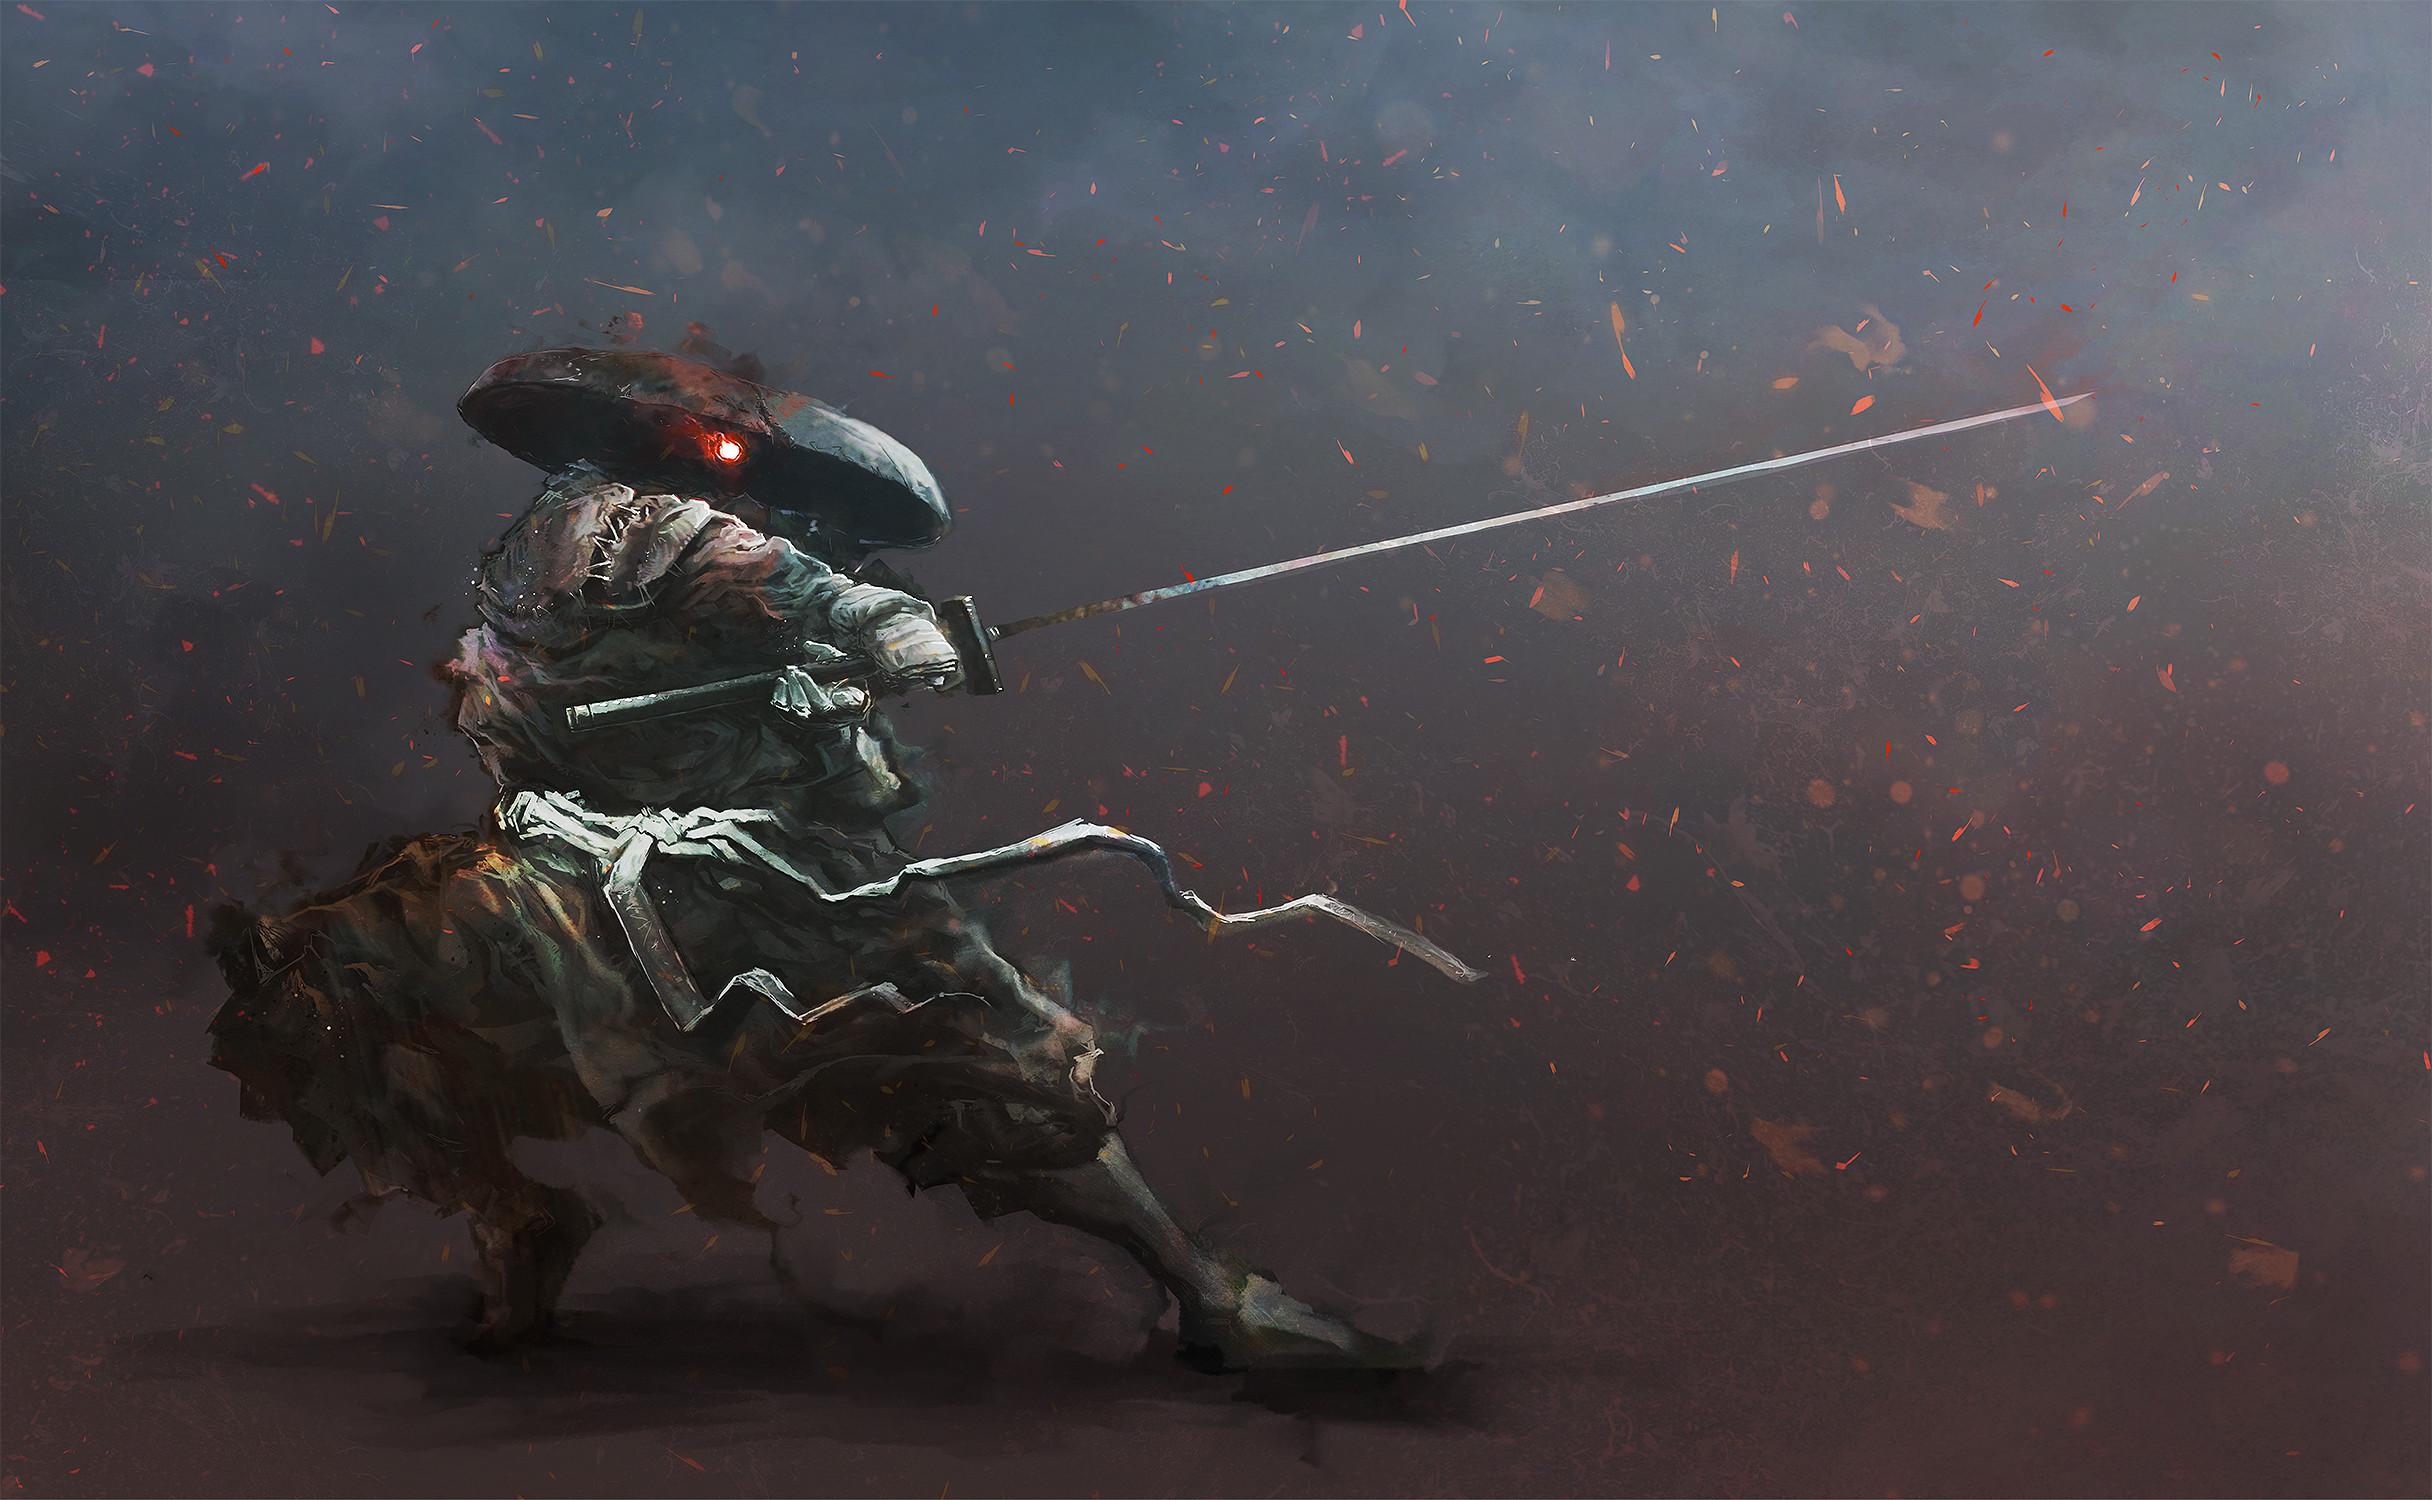 Res: 2432x1500, HD Wallpaper | Hintergrund ID:594668.  Fantasy Samurai